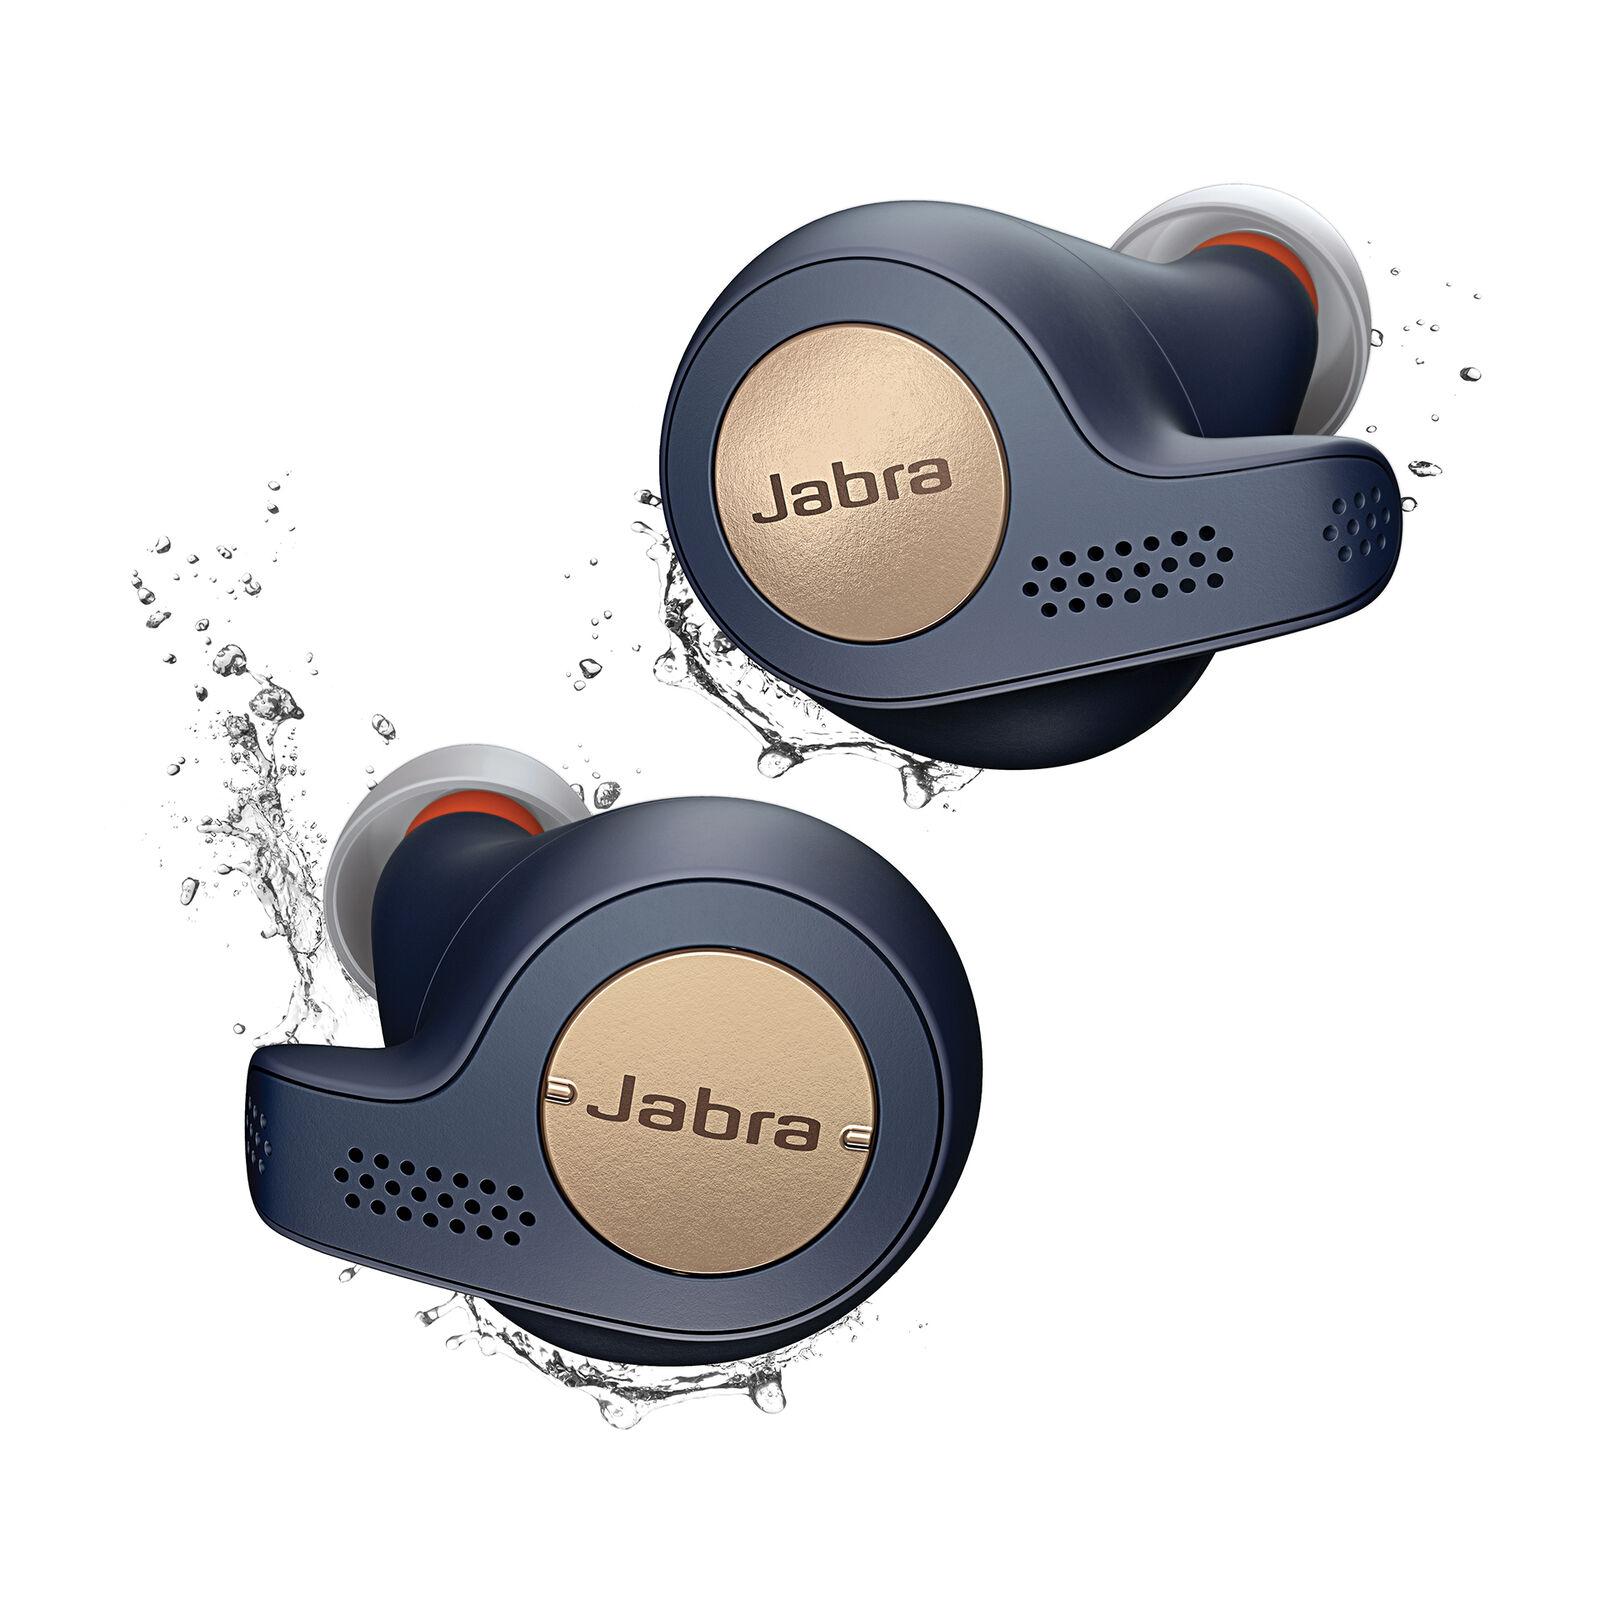 Manufacturer Refurb Jabra Elite Active 65t Bluetooth Wireless Headphones 2 year warranty £51.99 W/nectar Code @ jabra-company-store-uk/eBay